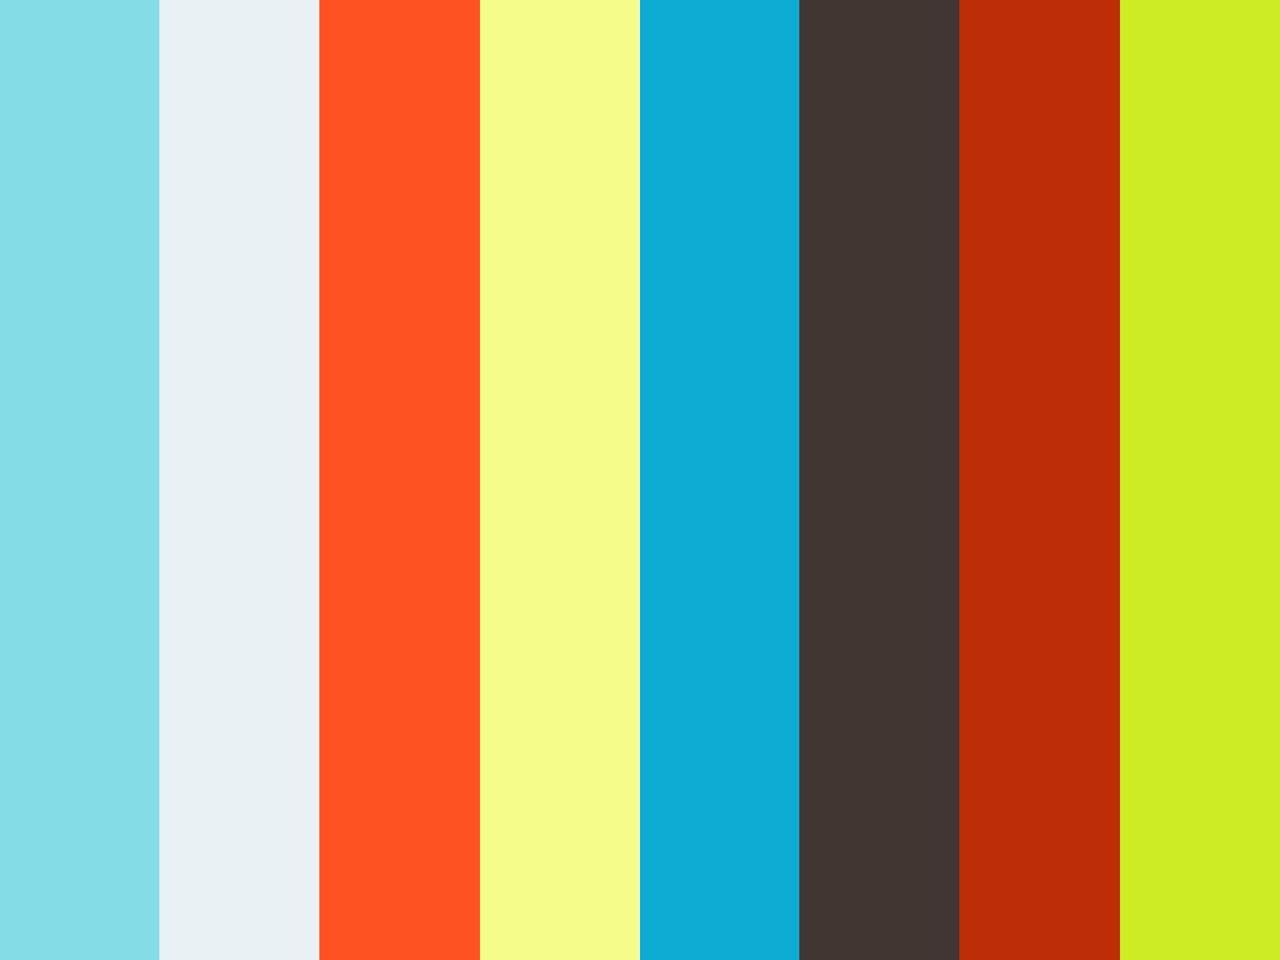 Mediators Foundation Transpartisan Leadership Program:  Design Team Comments